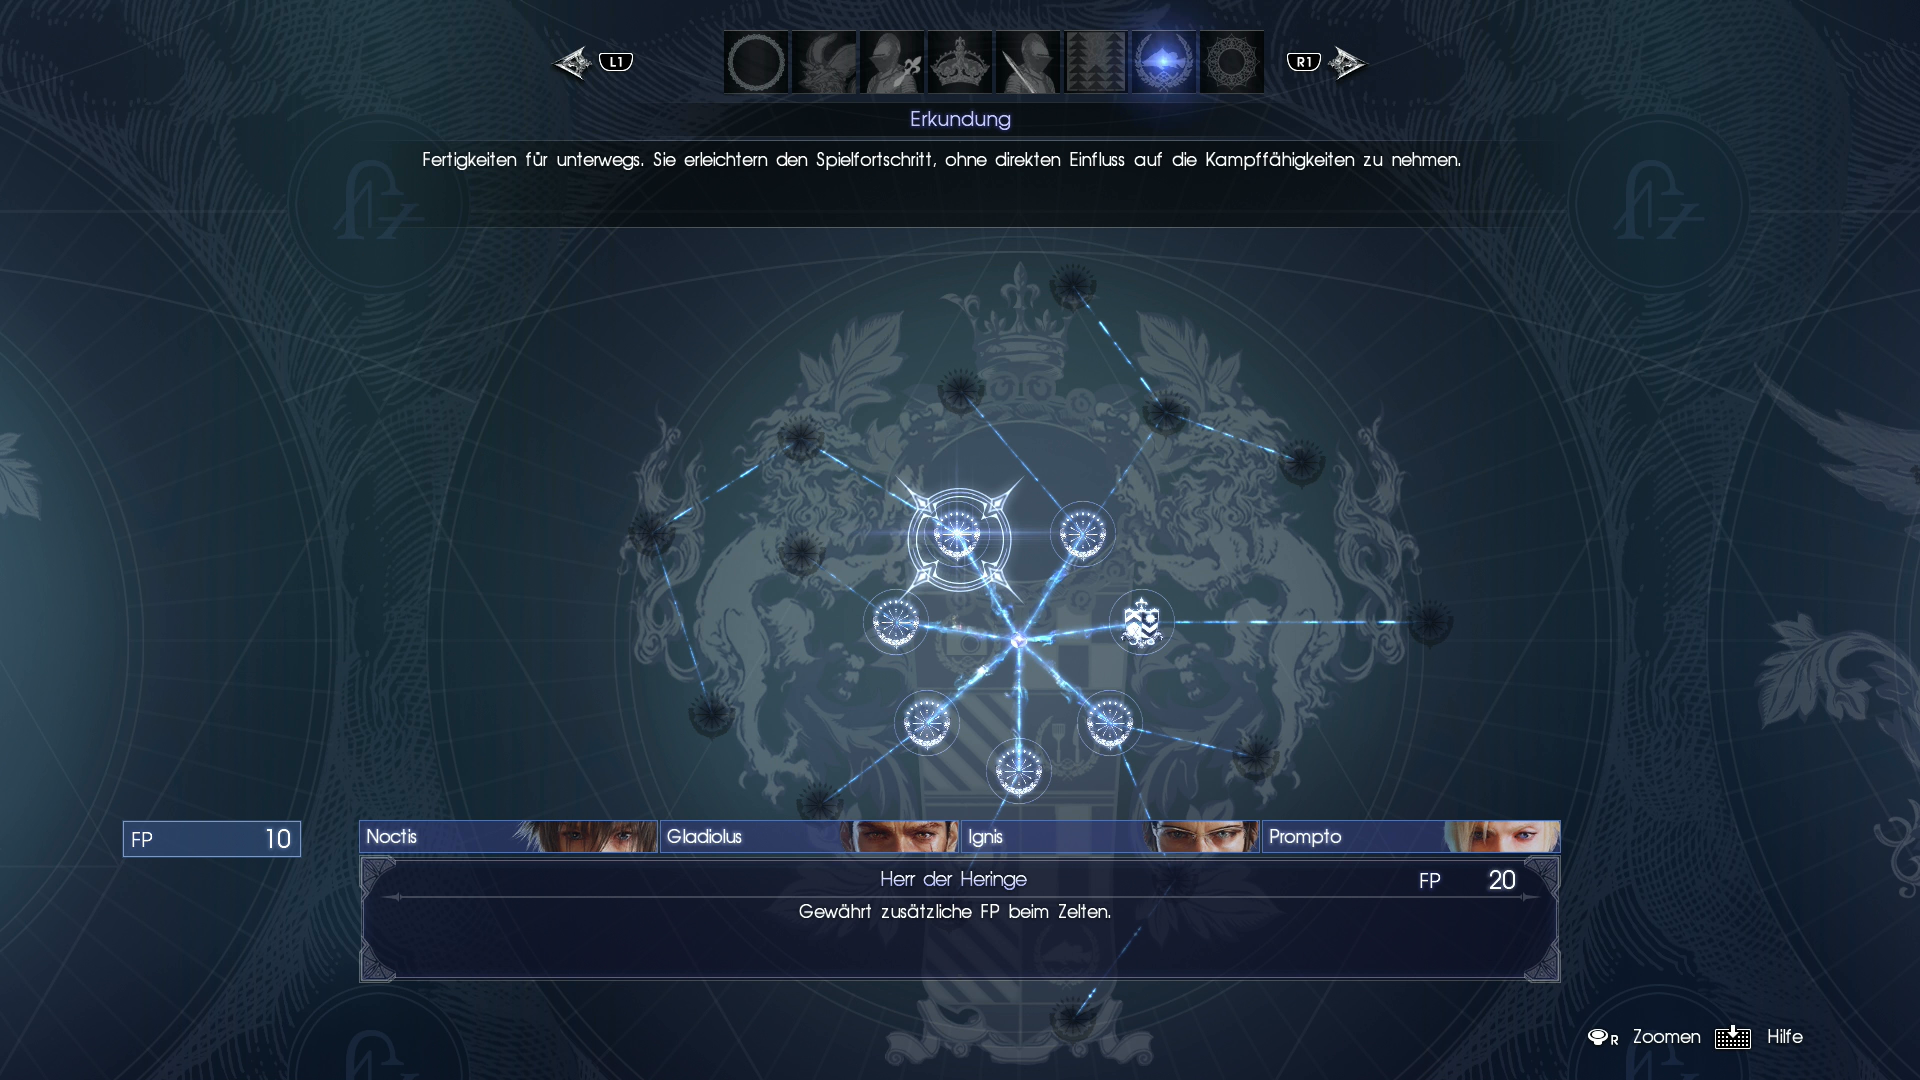 Final Fantasy 15 Königswaffen Karte.Final Fantasy Xv Walkthrough Tipps Zu Kampf Fp Ausrüstung Geld